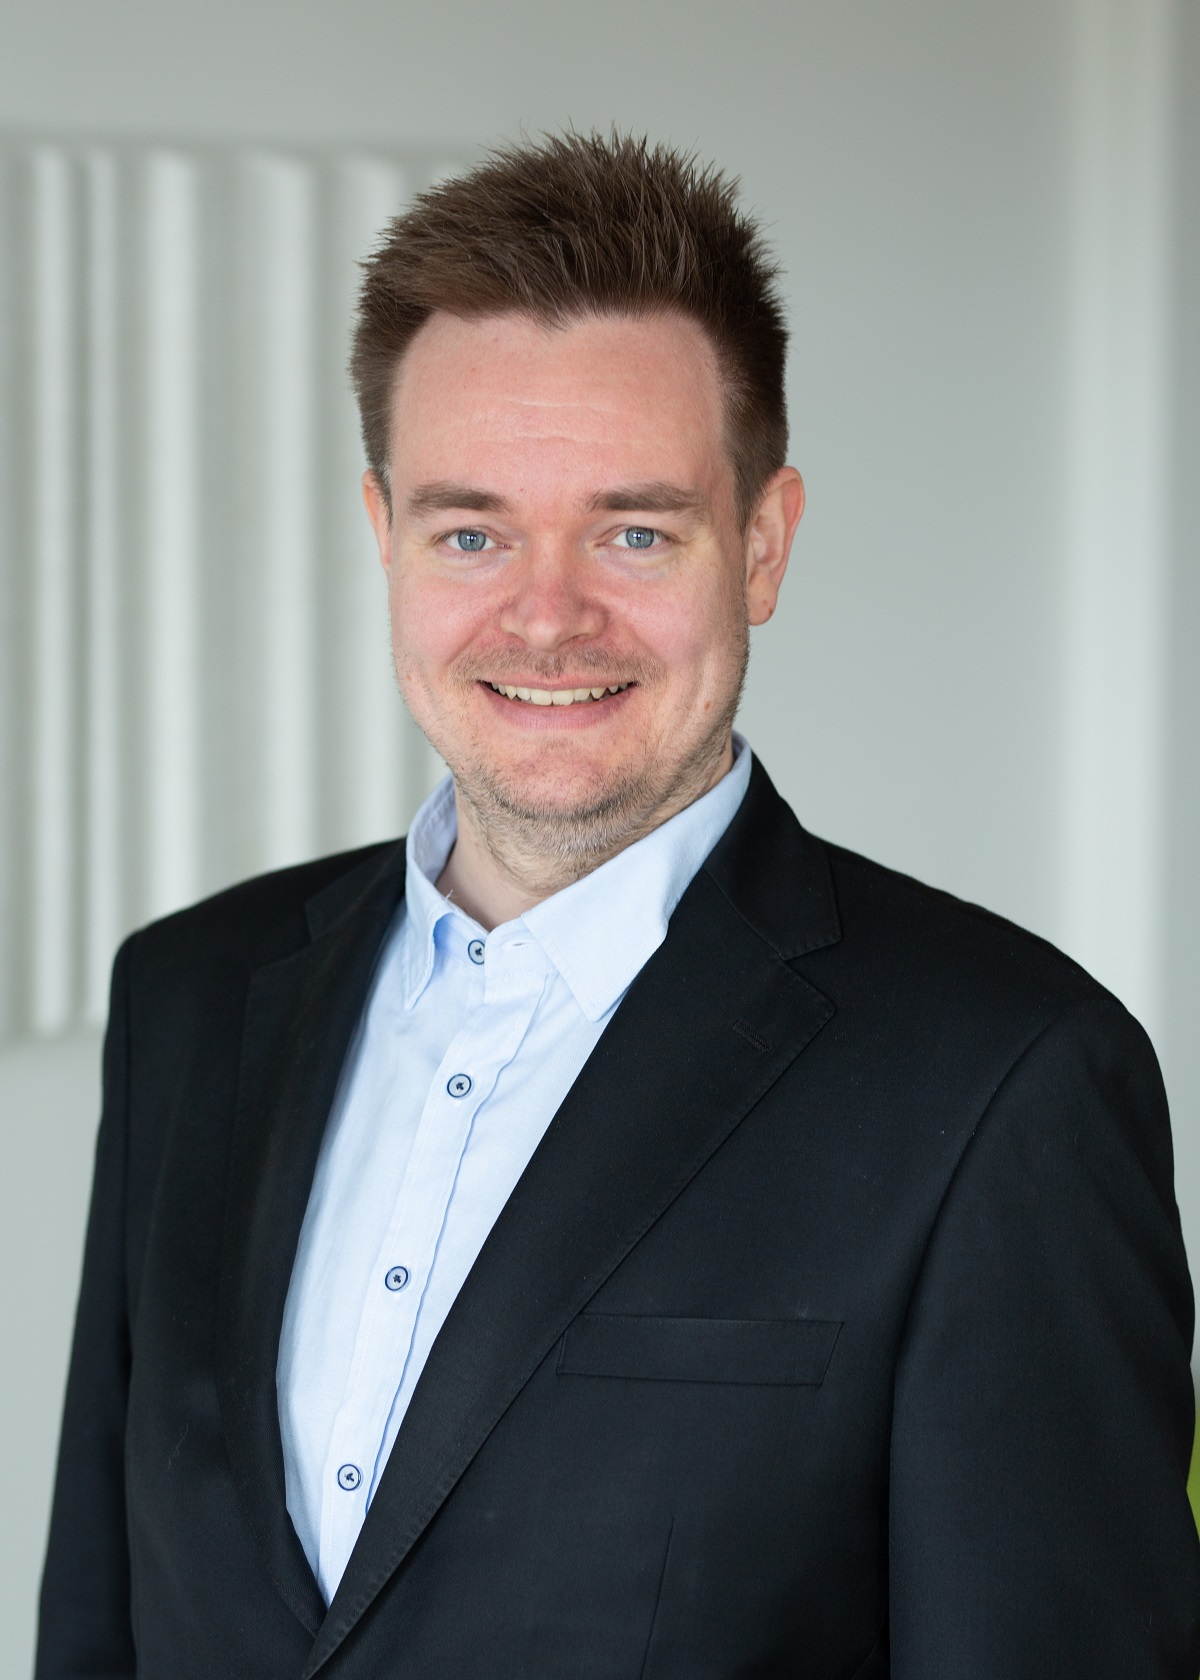 Sami Tikkanen